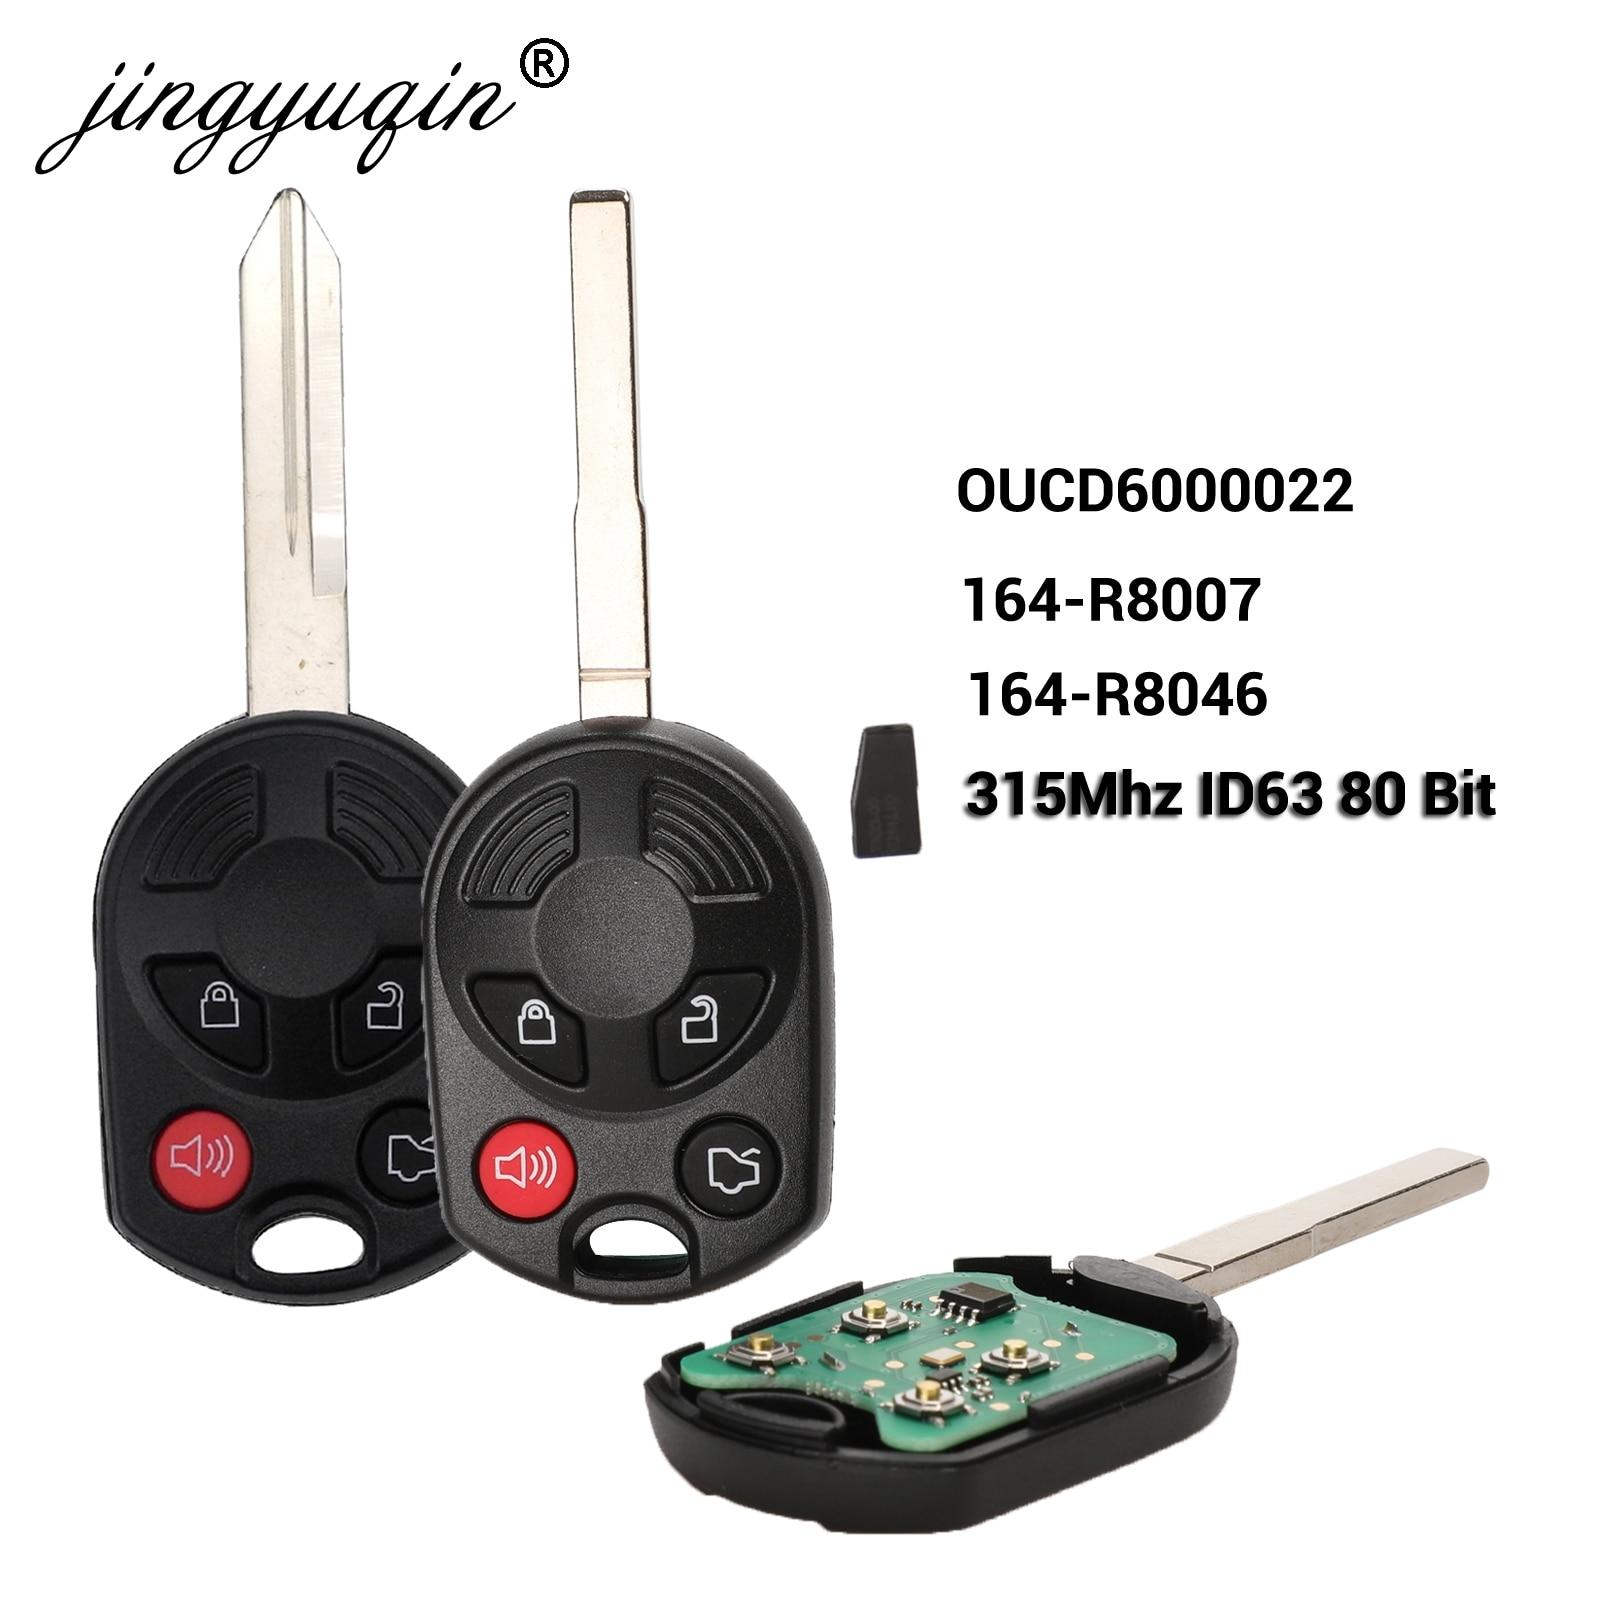 Jingyuqin дистанционный ключ-брелок от машины для Ford C-Max Edge Escape Focus Lincoln Mazda Mercury OUCD6000022 315Mhz передатчик ID63 80bit 4B